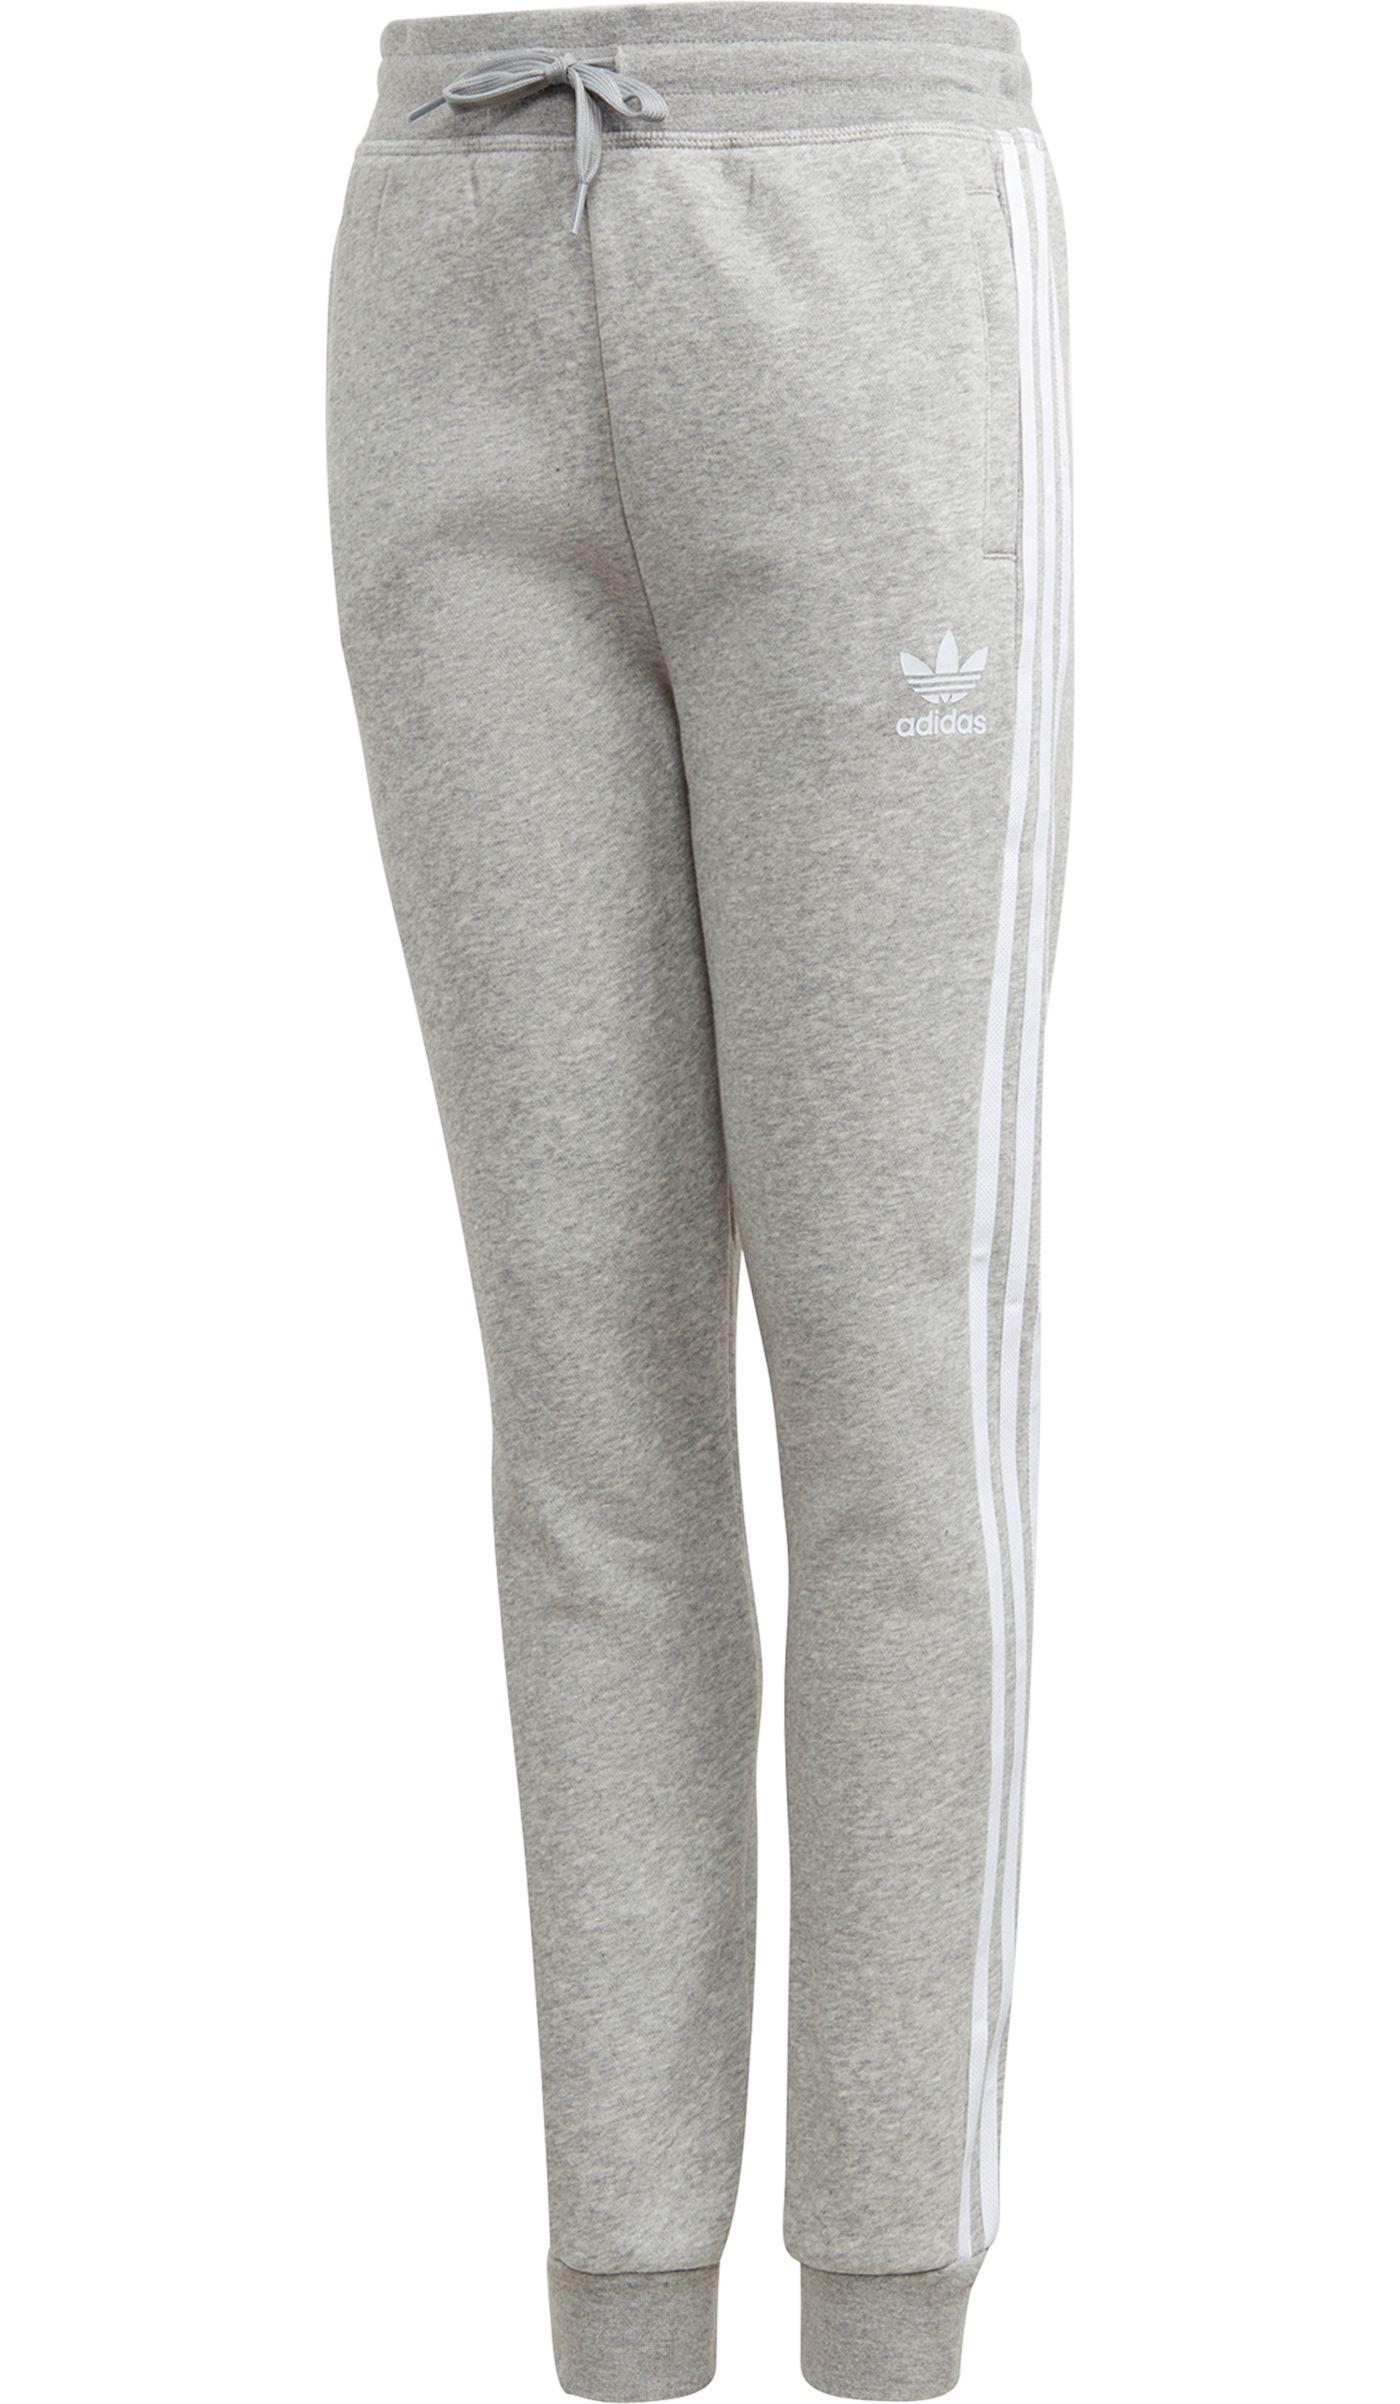 adidas Originals Boys' Trefoil Pants